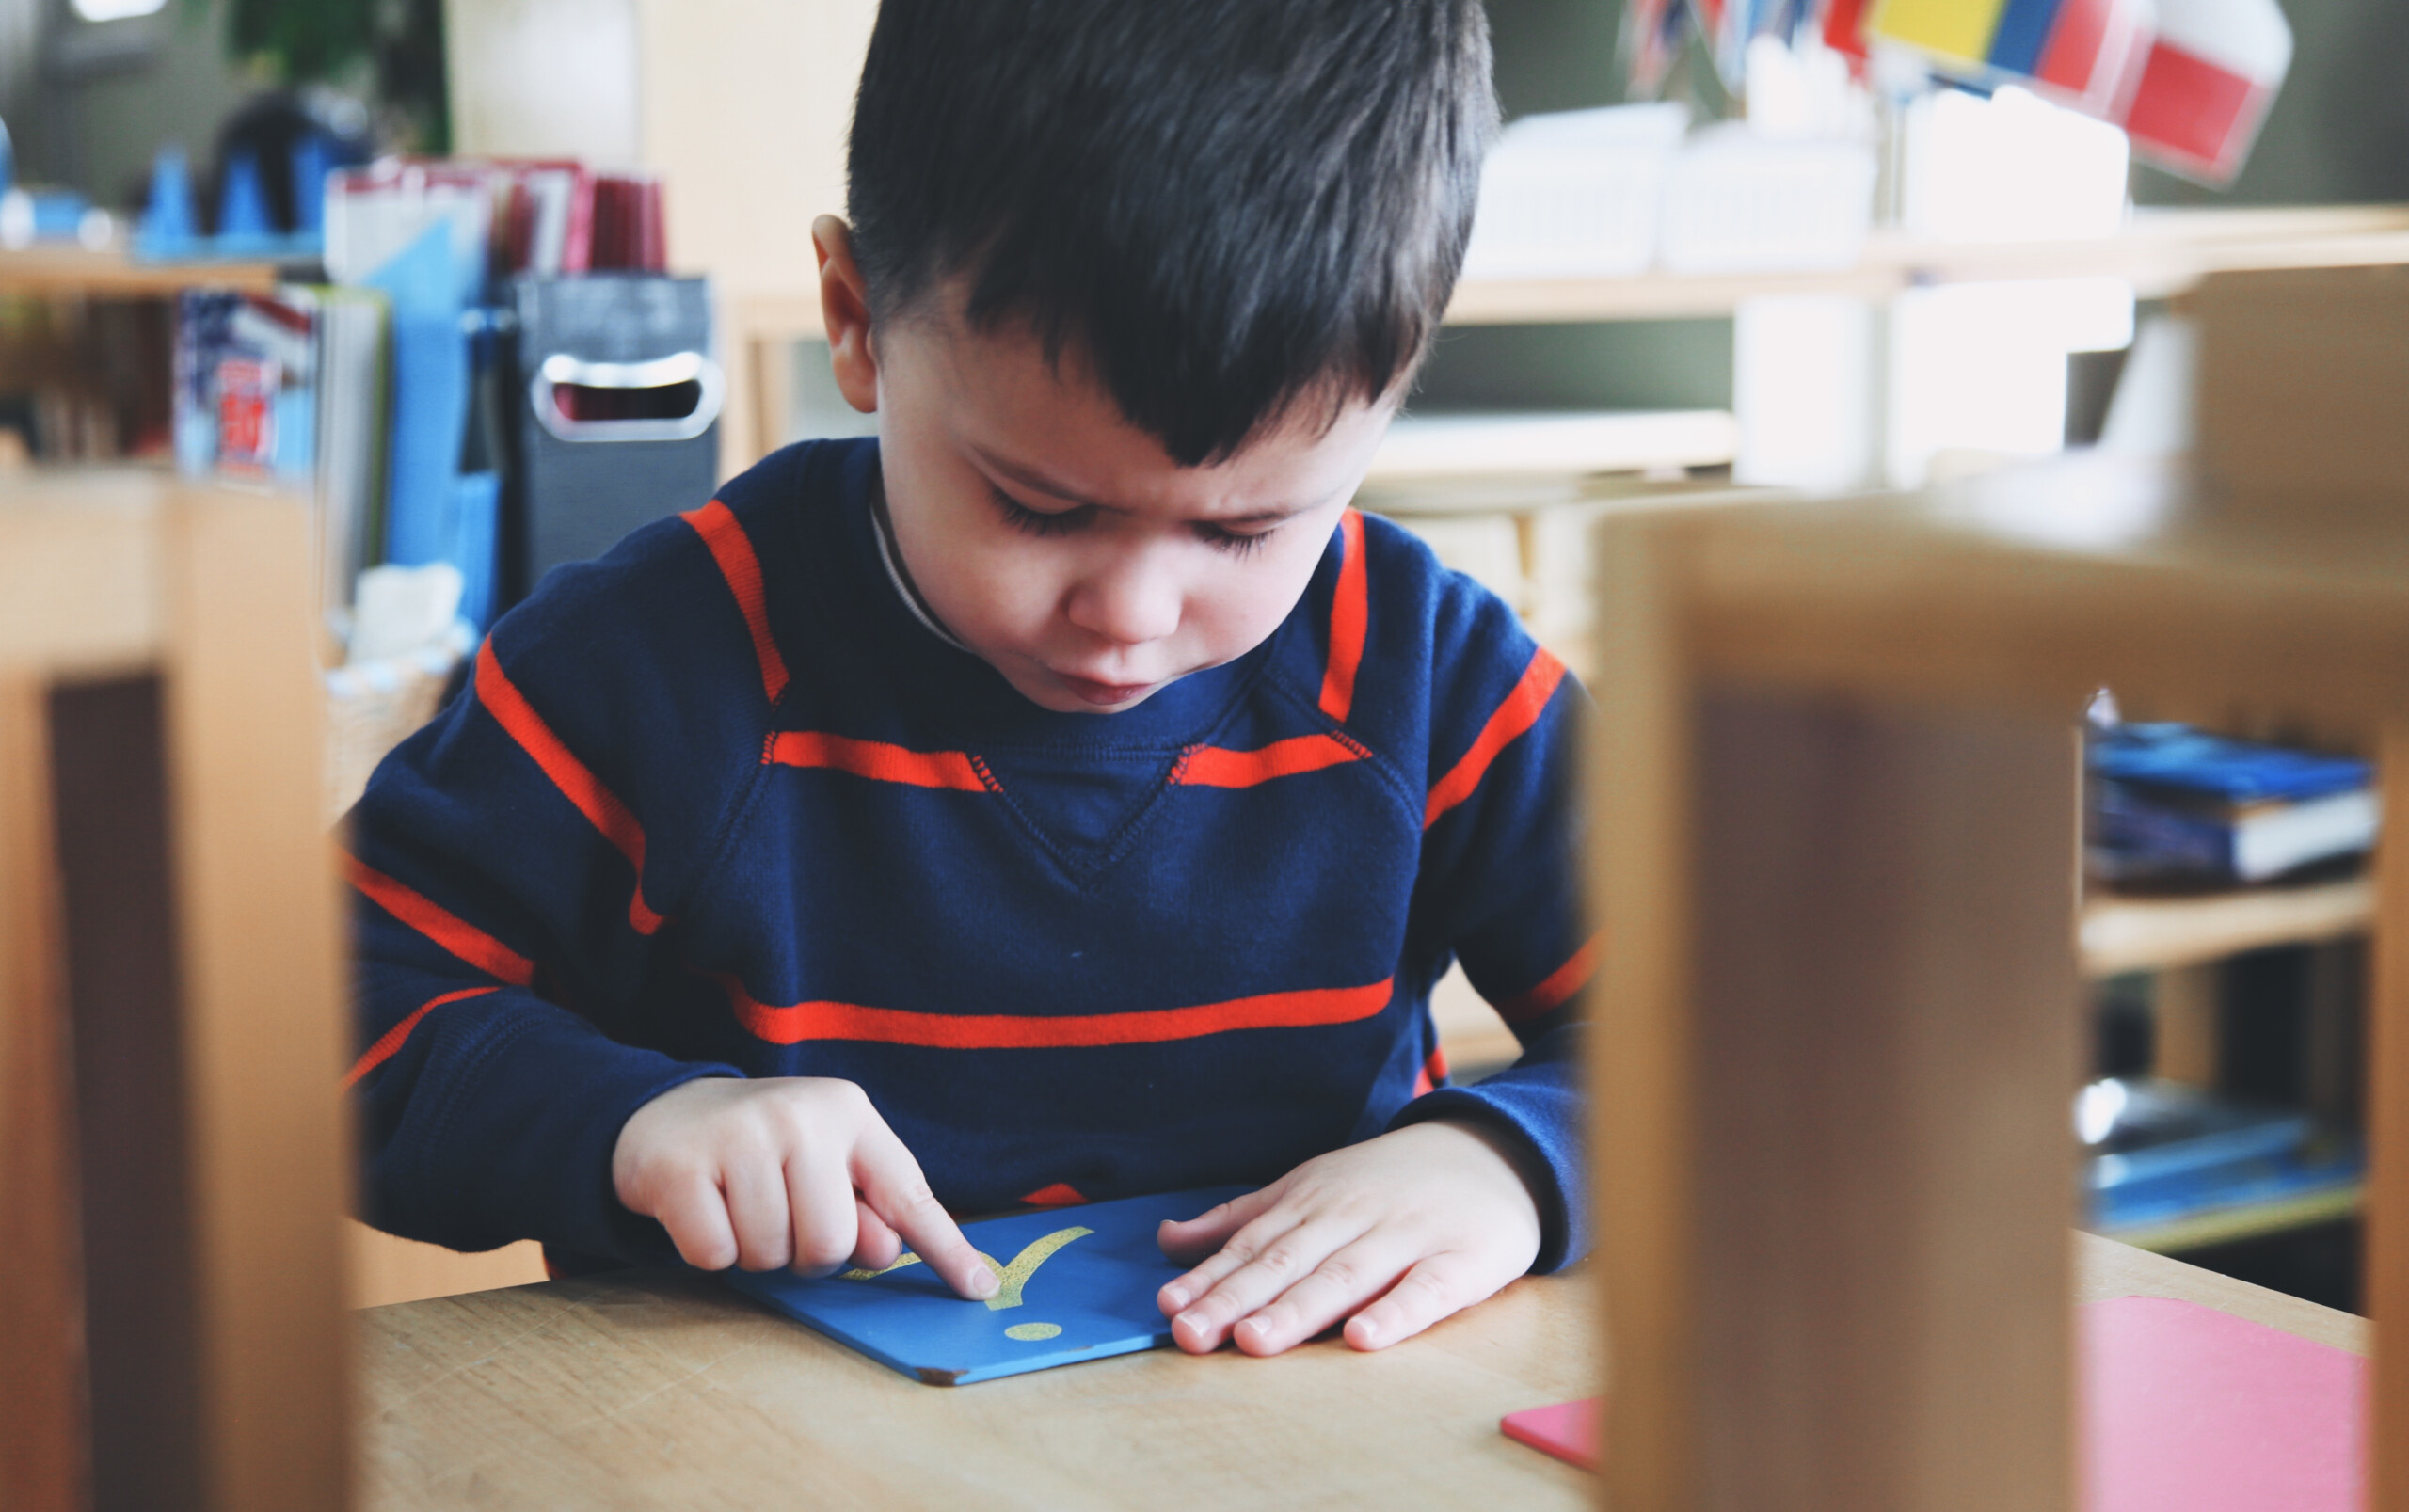 Montessori Encyclopedia: Sandpaper Letters - Baan Dek with Tracing Sandpaper Letters